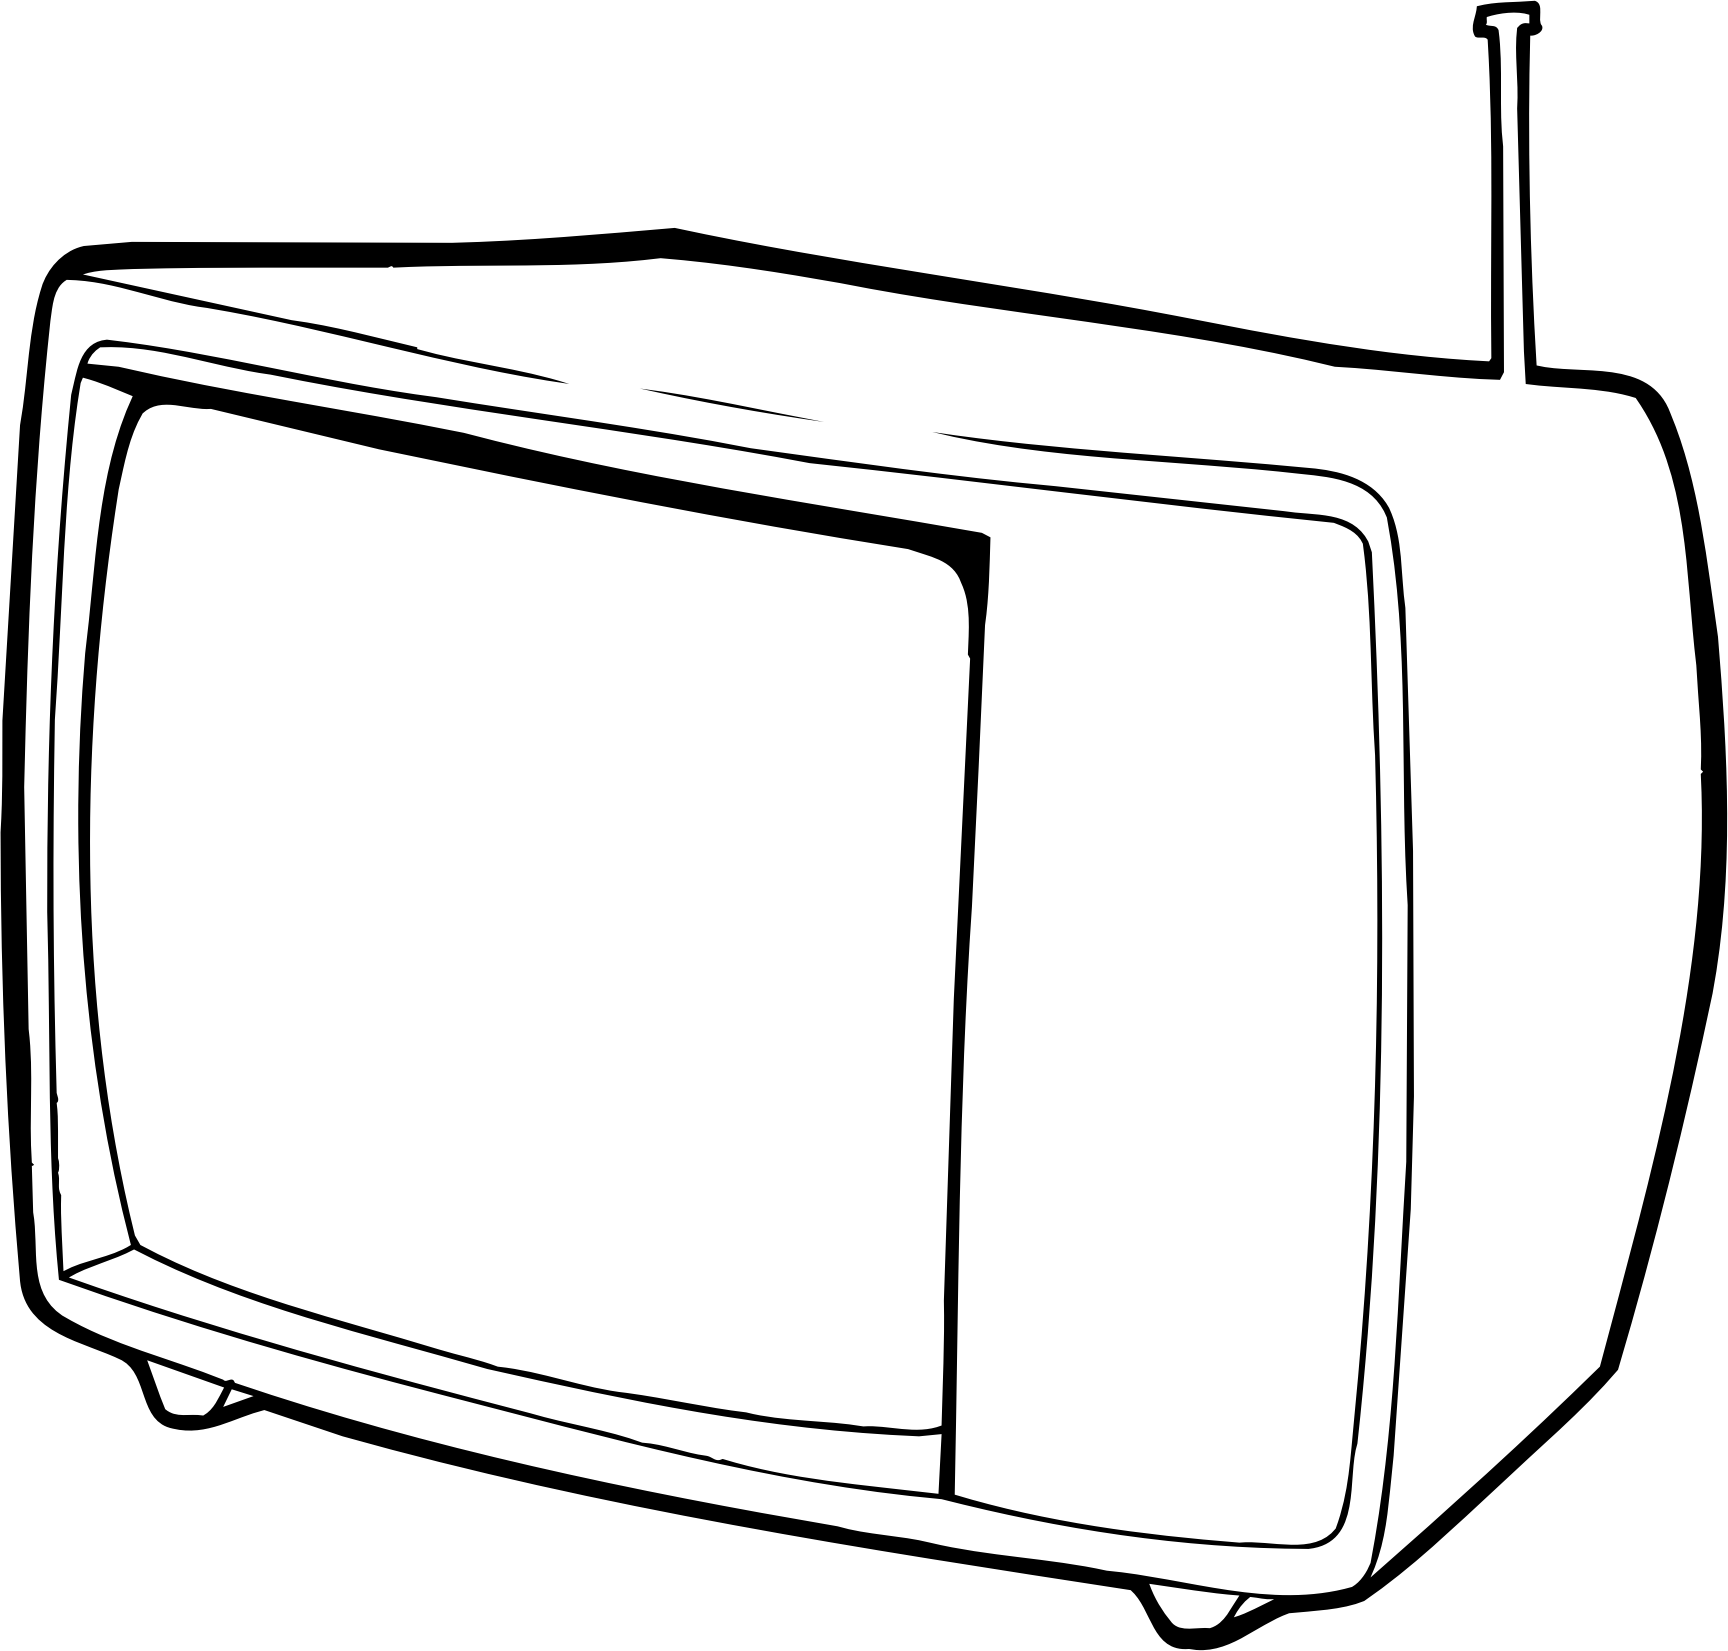 Tv black and white. Square clipart television